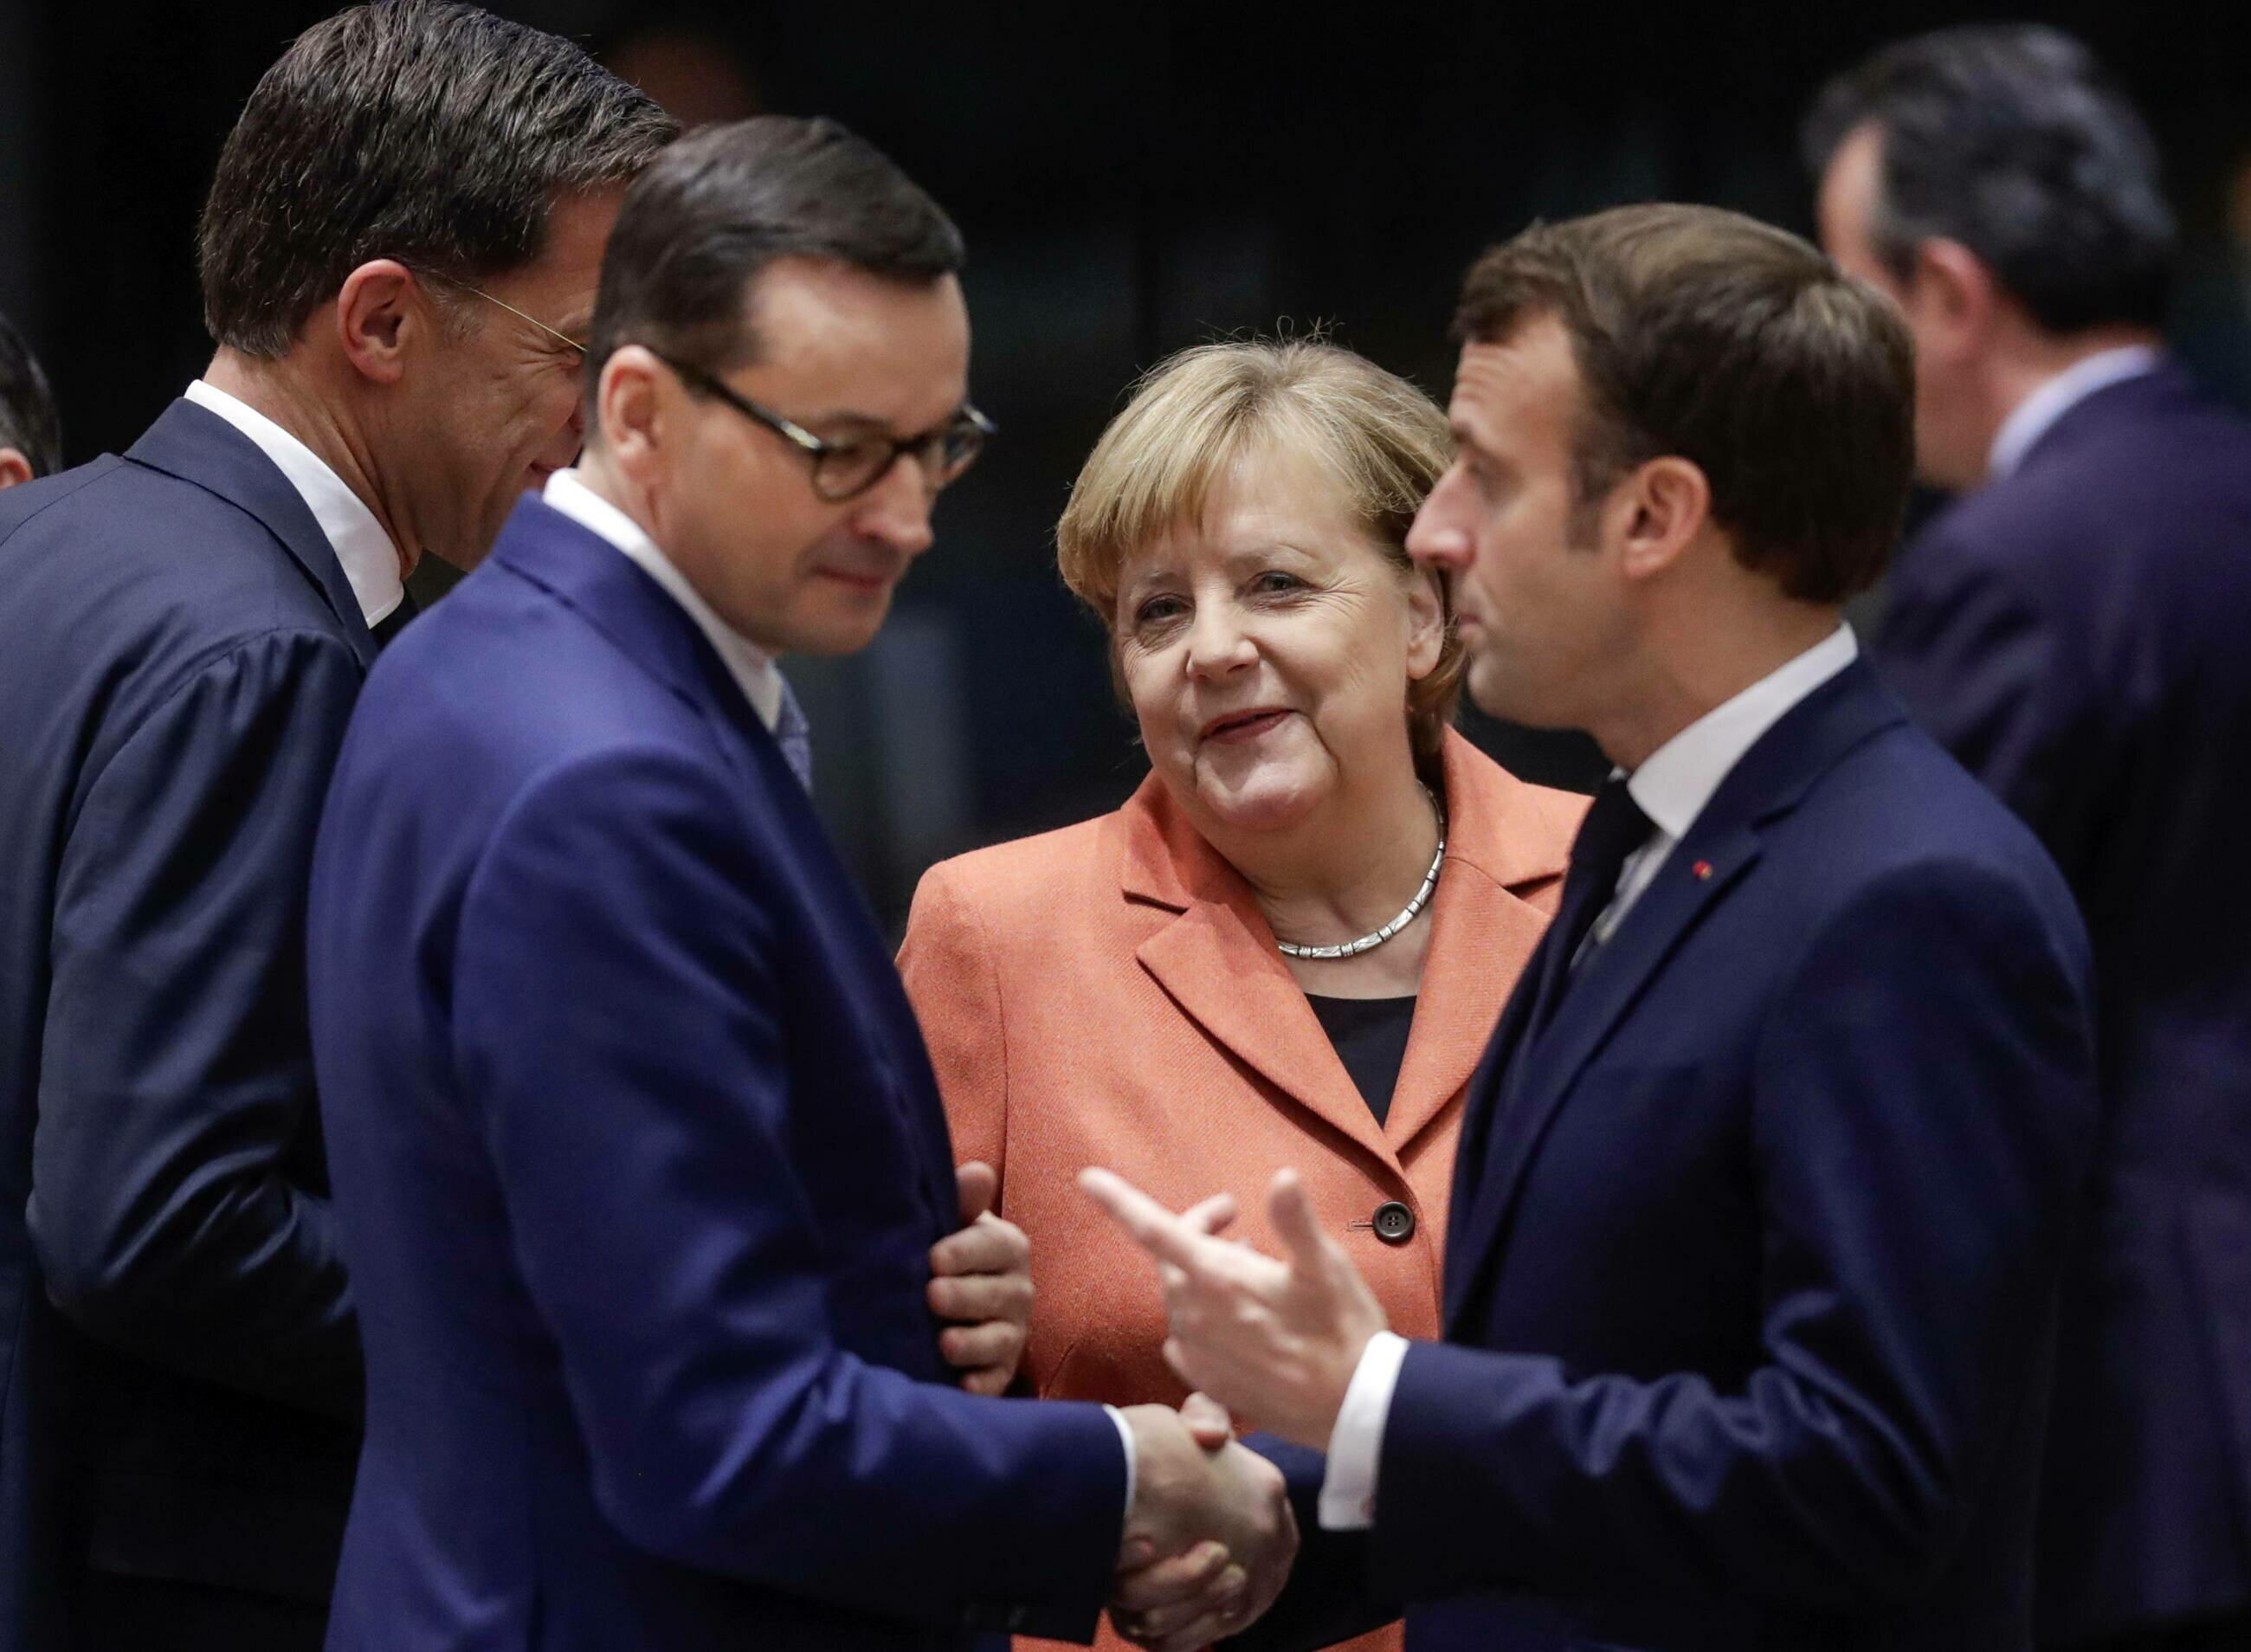 Premier Mateusz Morawiecki, kanclerz Niemiec Angela Merkel i prezydent Francji Emmanuel Macron.